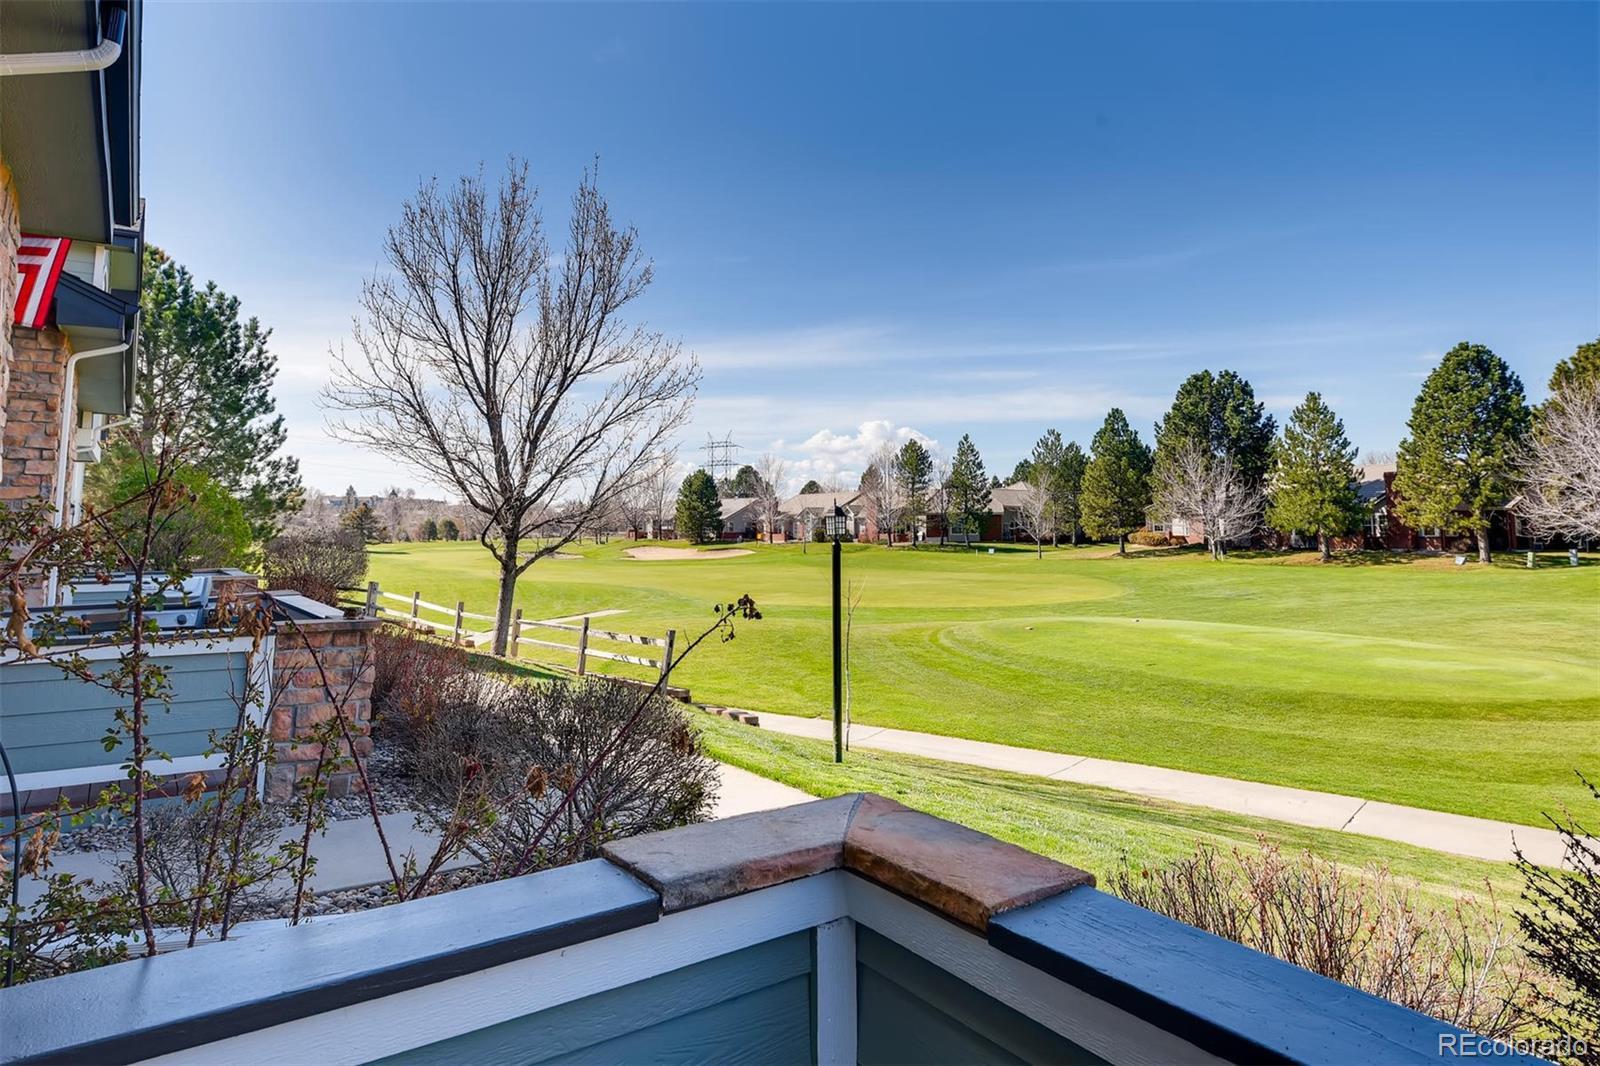 MLS# 7842645 - 2 - 2778 W Greens Drive, Littleton, CO 80123